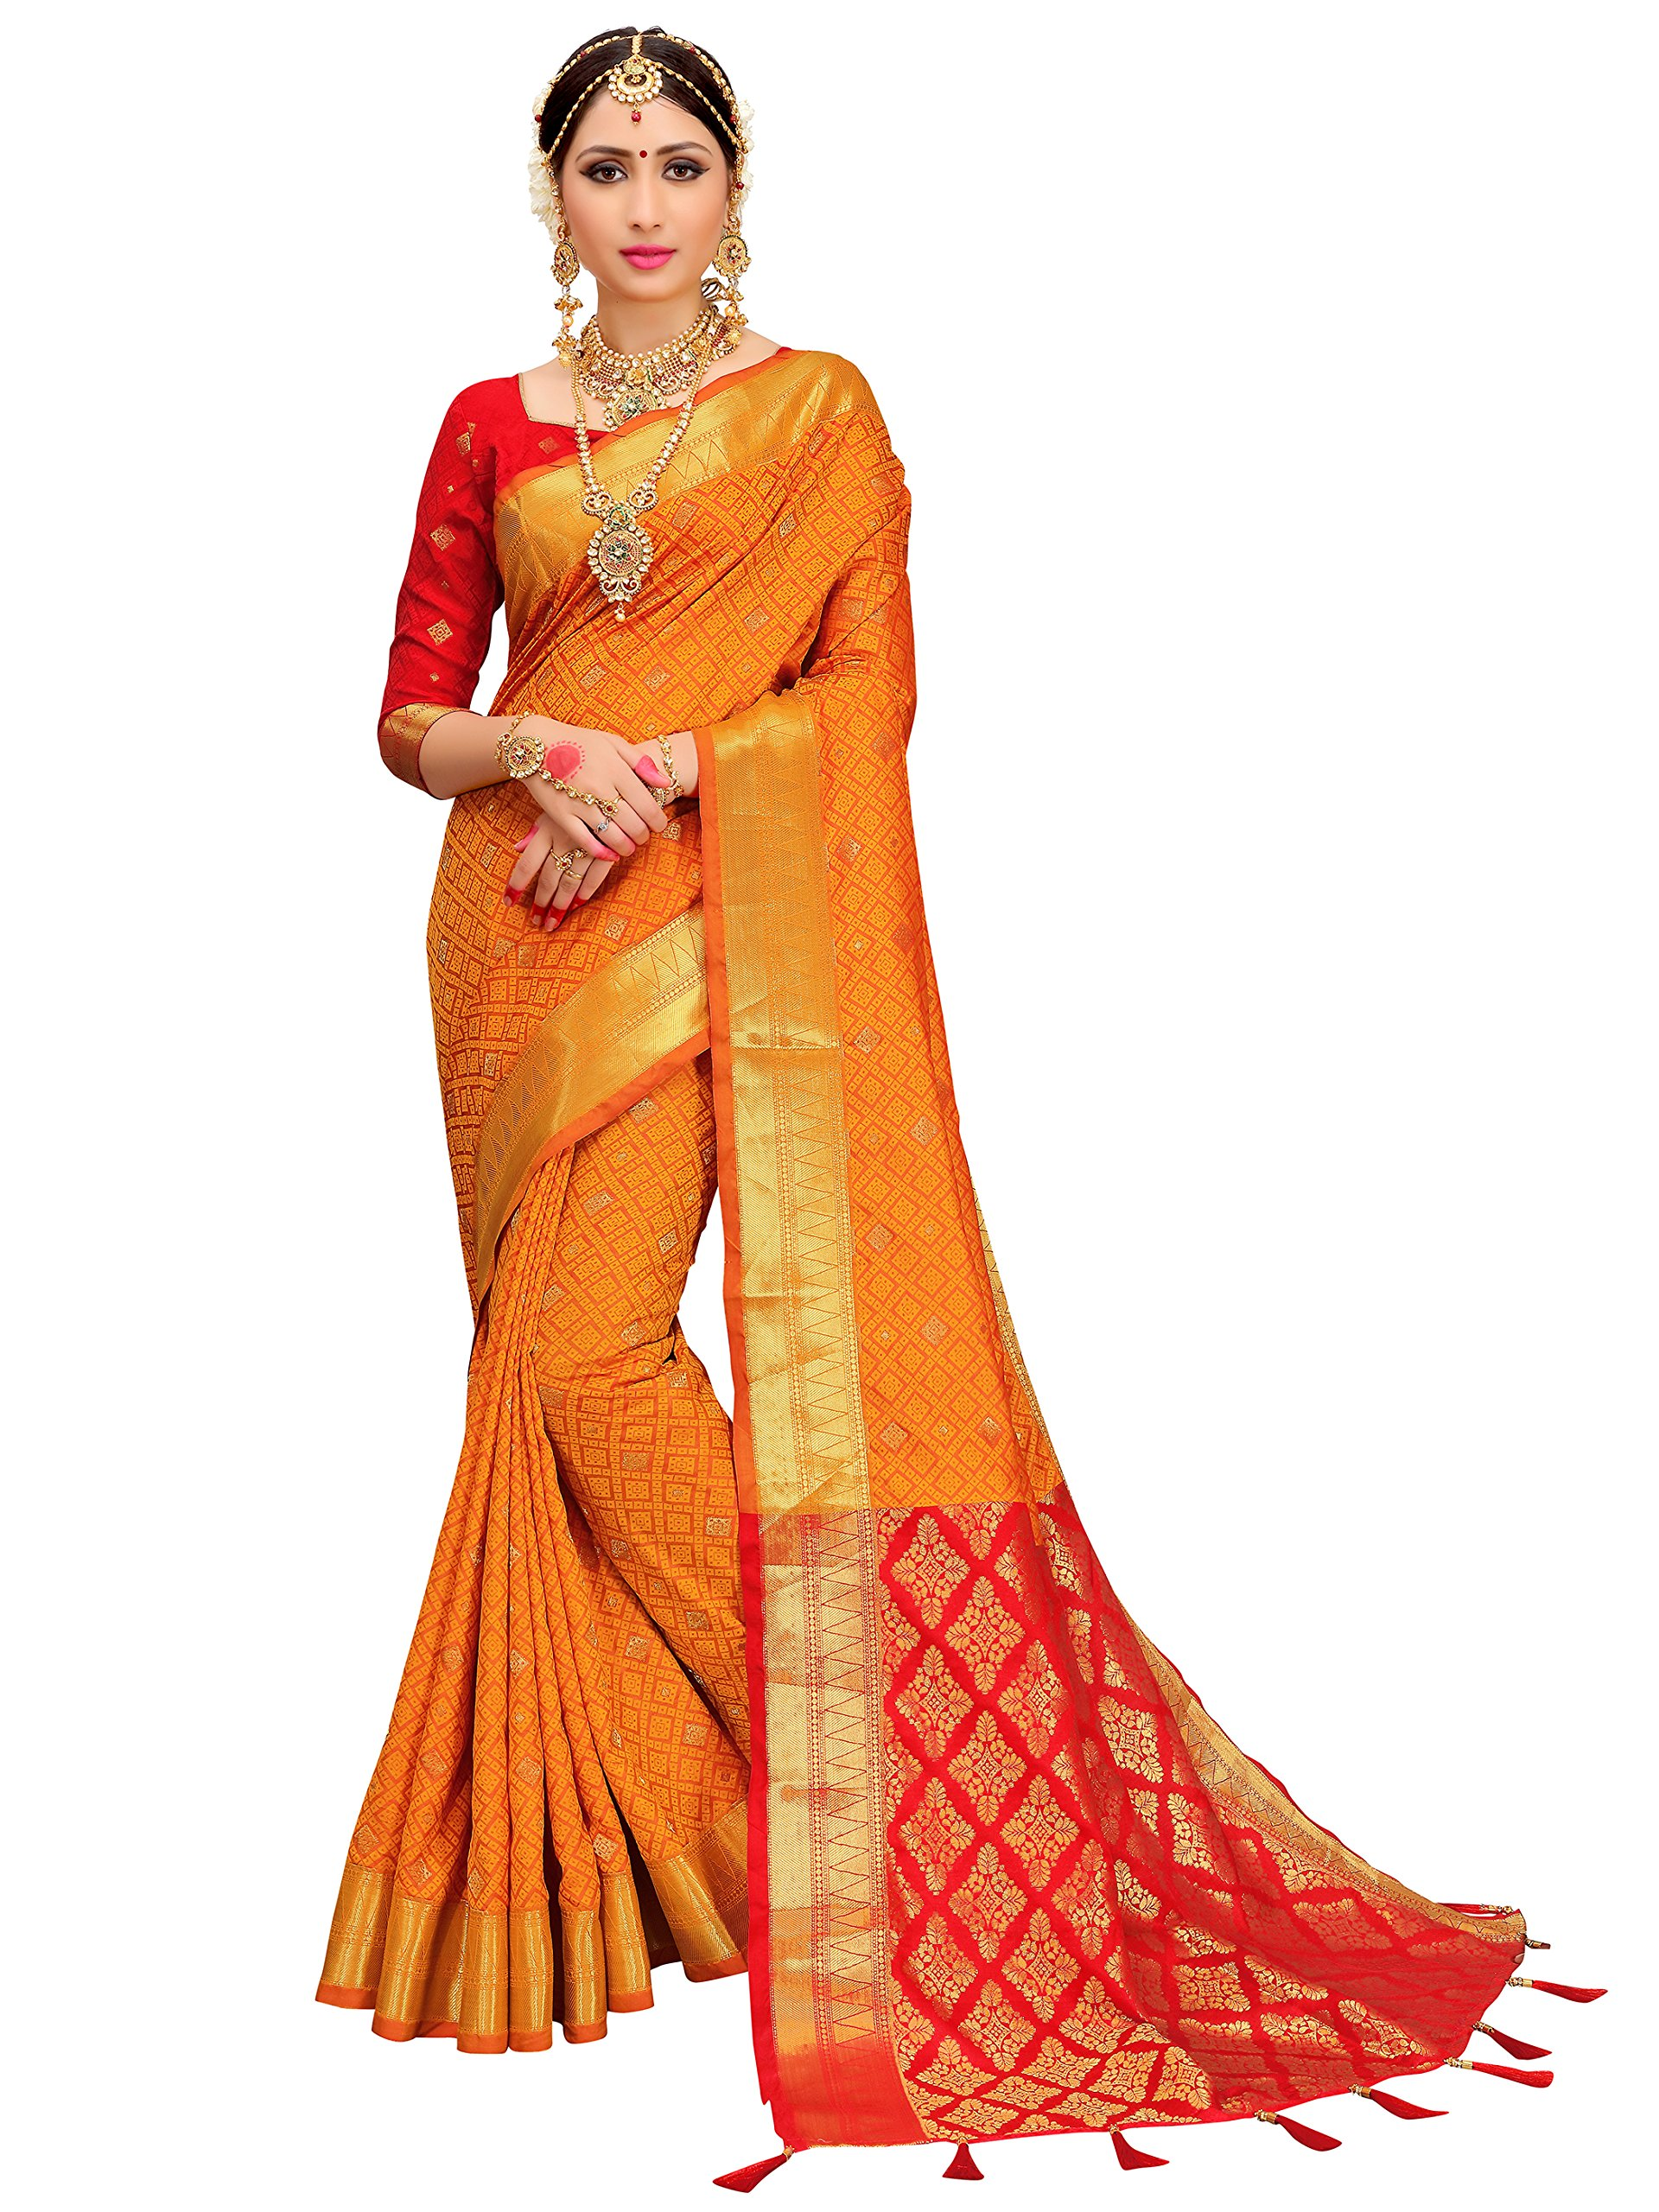 ELINA FASHION Sarees for Women Patola Art Silk Woven Work Saree l Indian Traditional Wedding Ethnic Sari with Blouse Piece (Yellow)